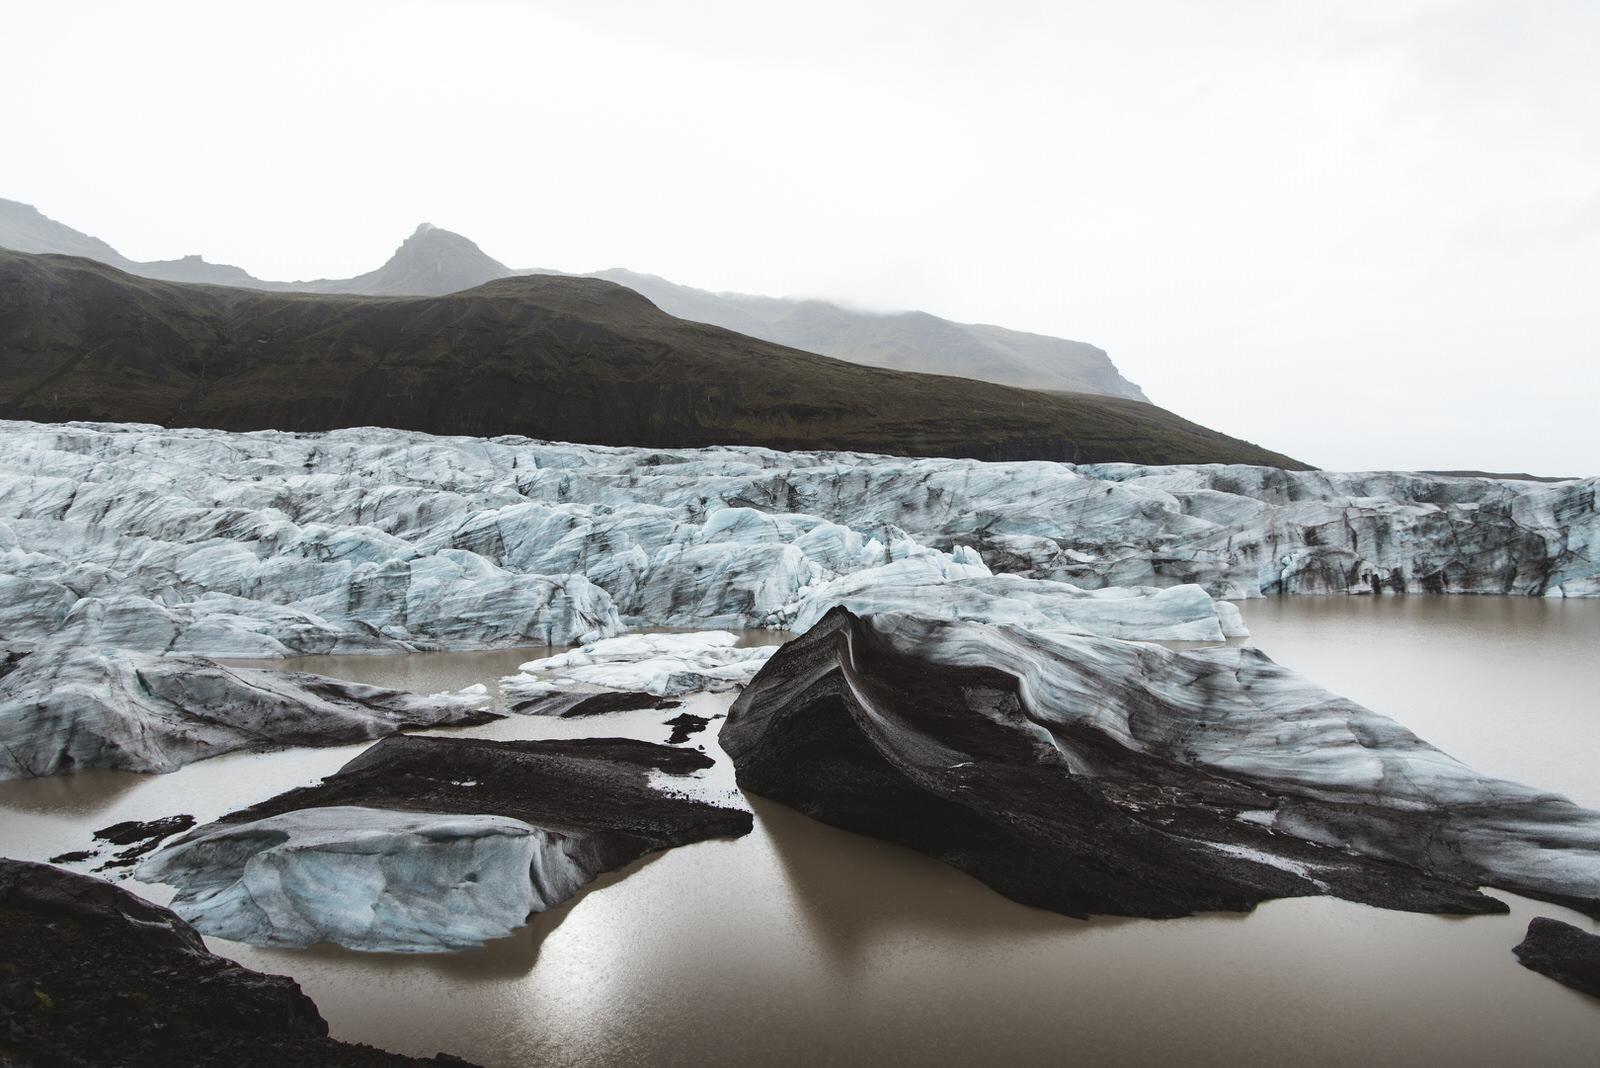 iceland road trip day 2 - svinafellsjokull stokksnes jokulsarlon